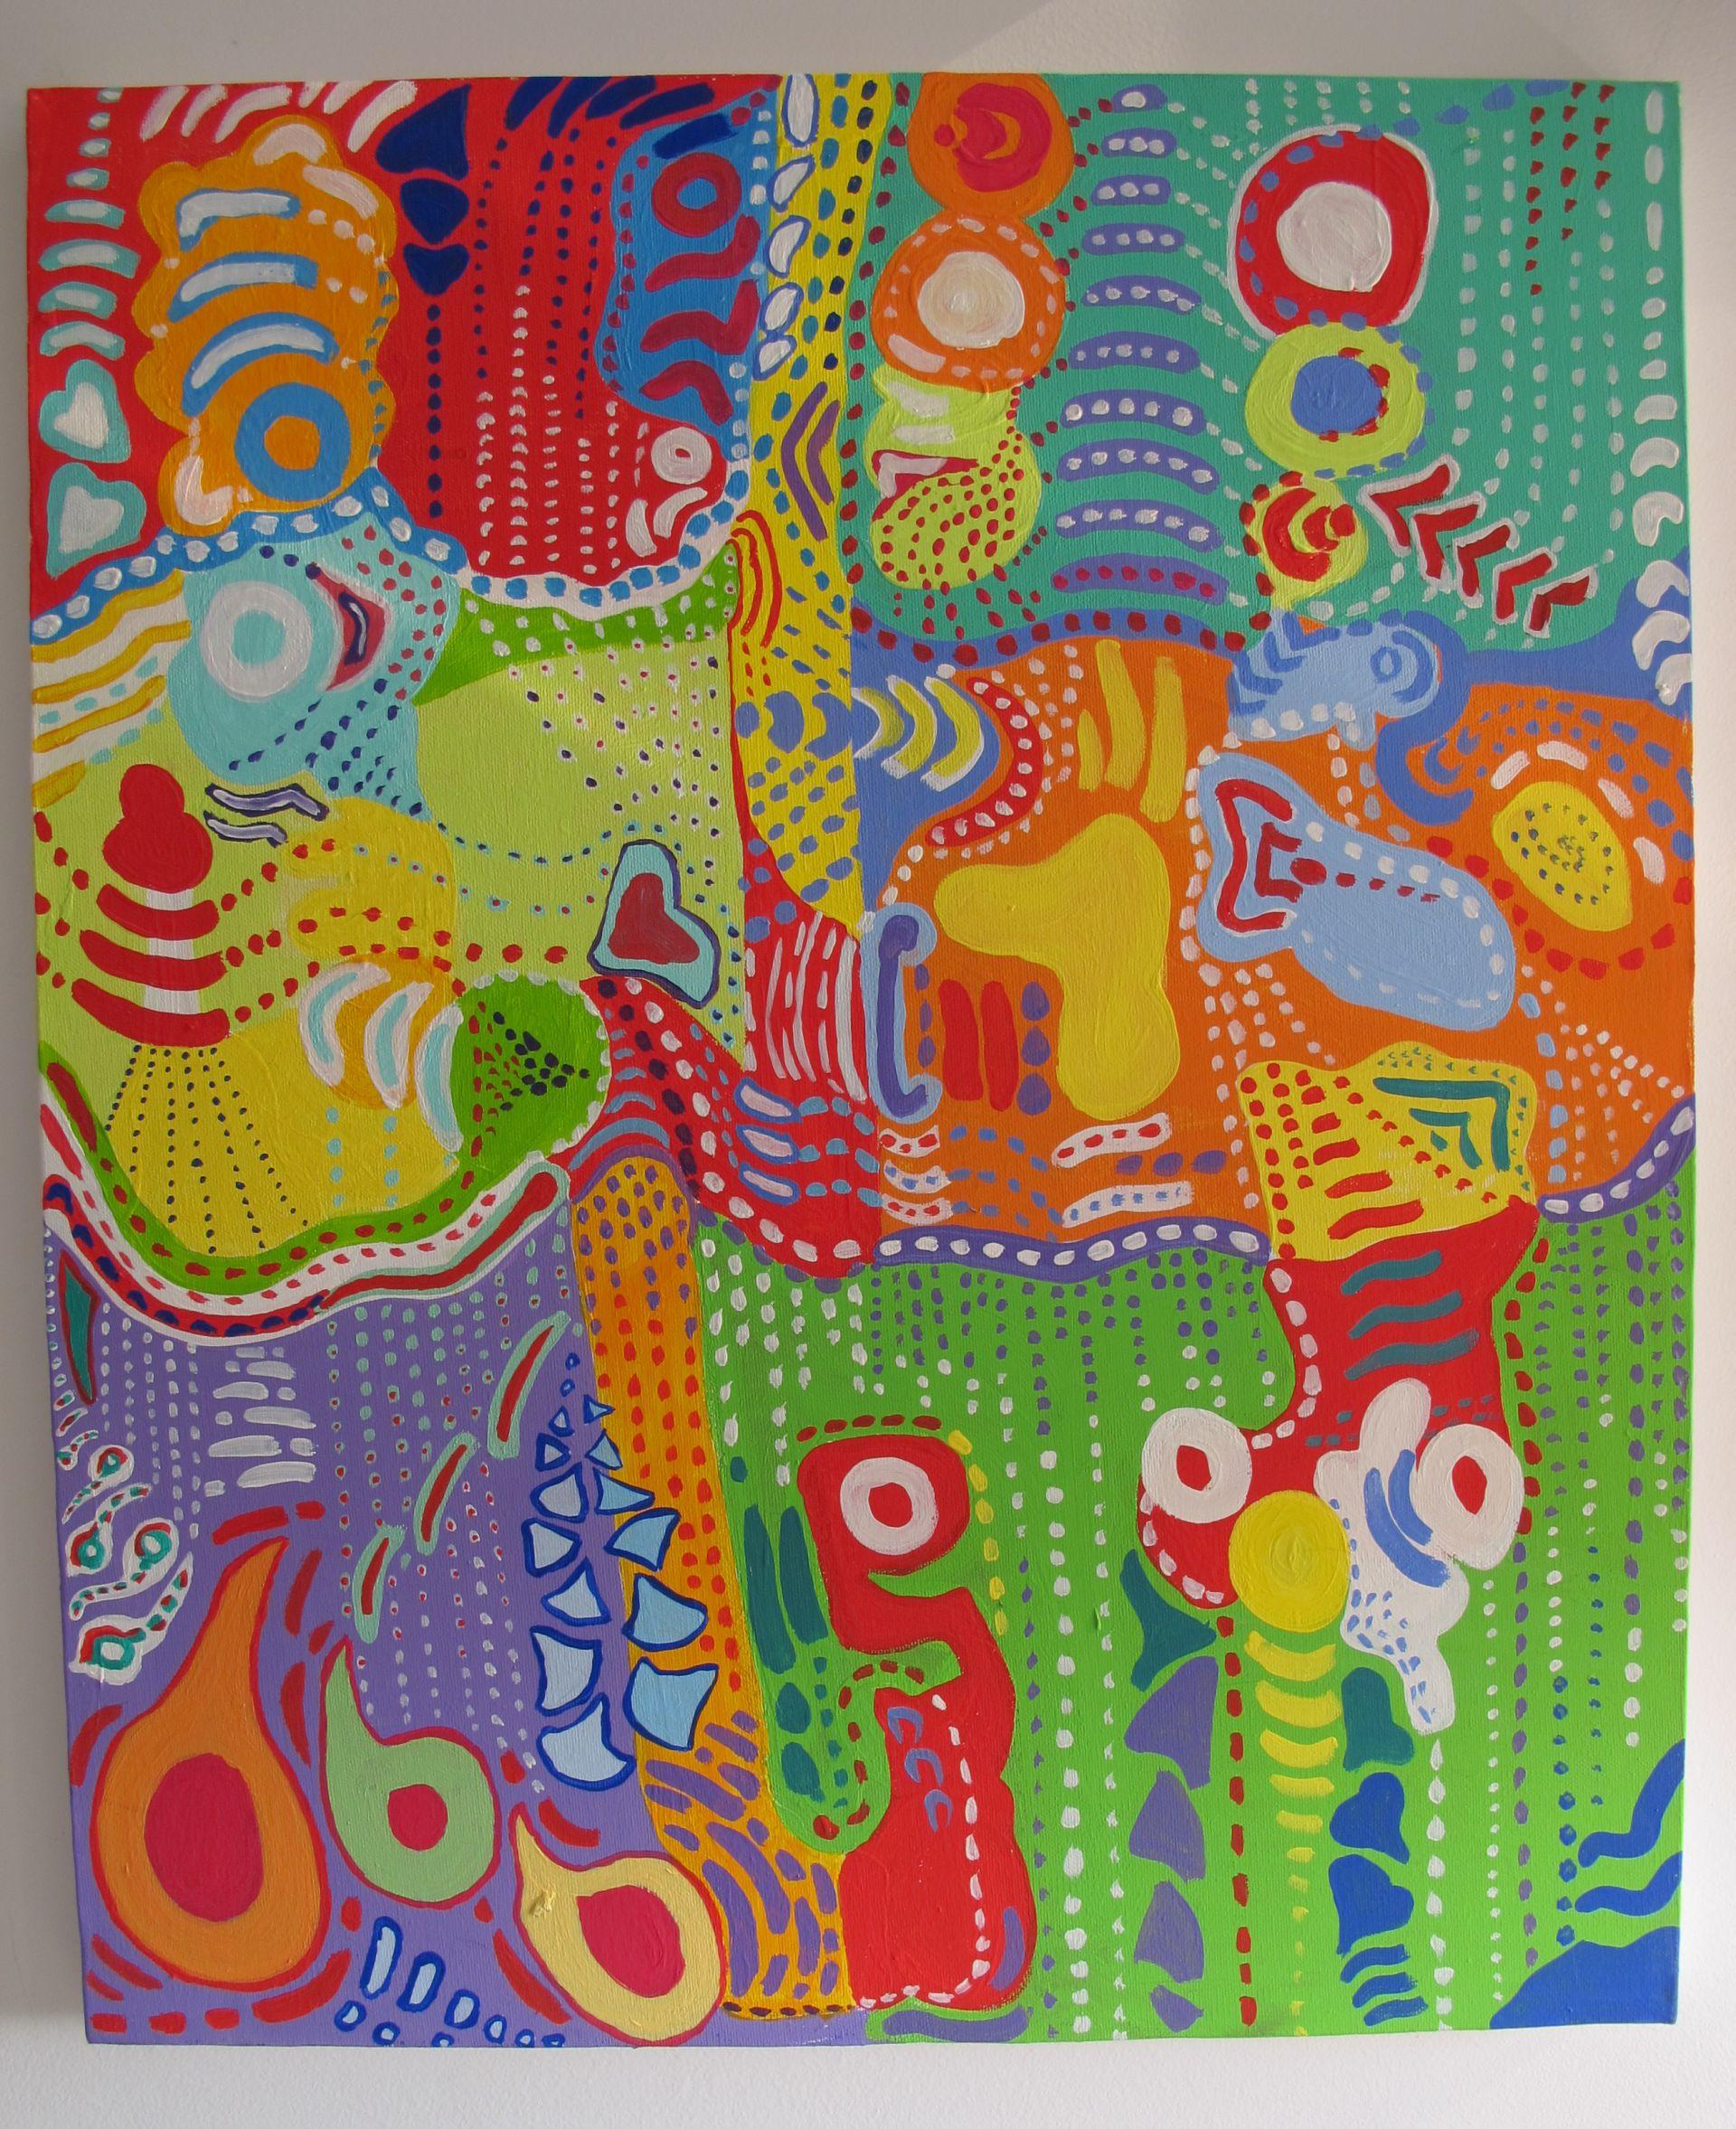 Picaturi de energie, 2009, tablou Adela Parvu